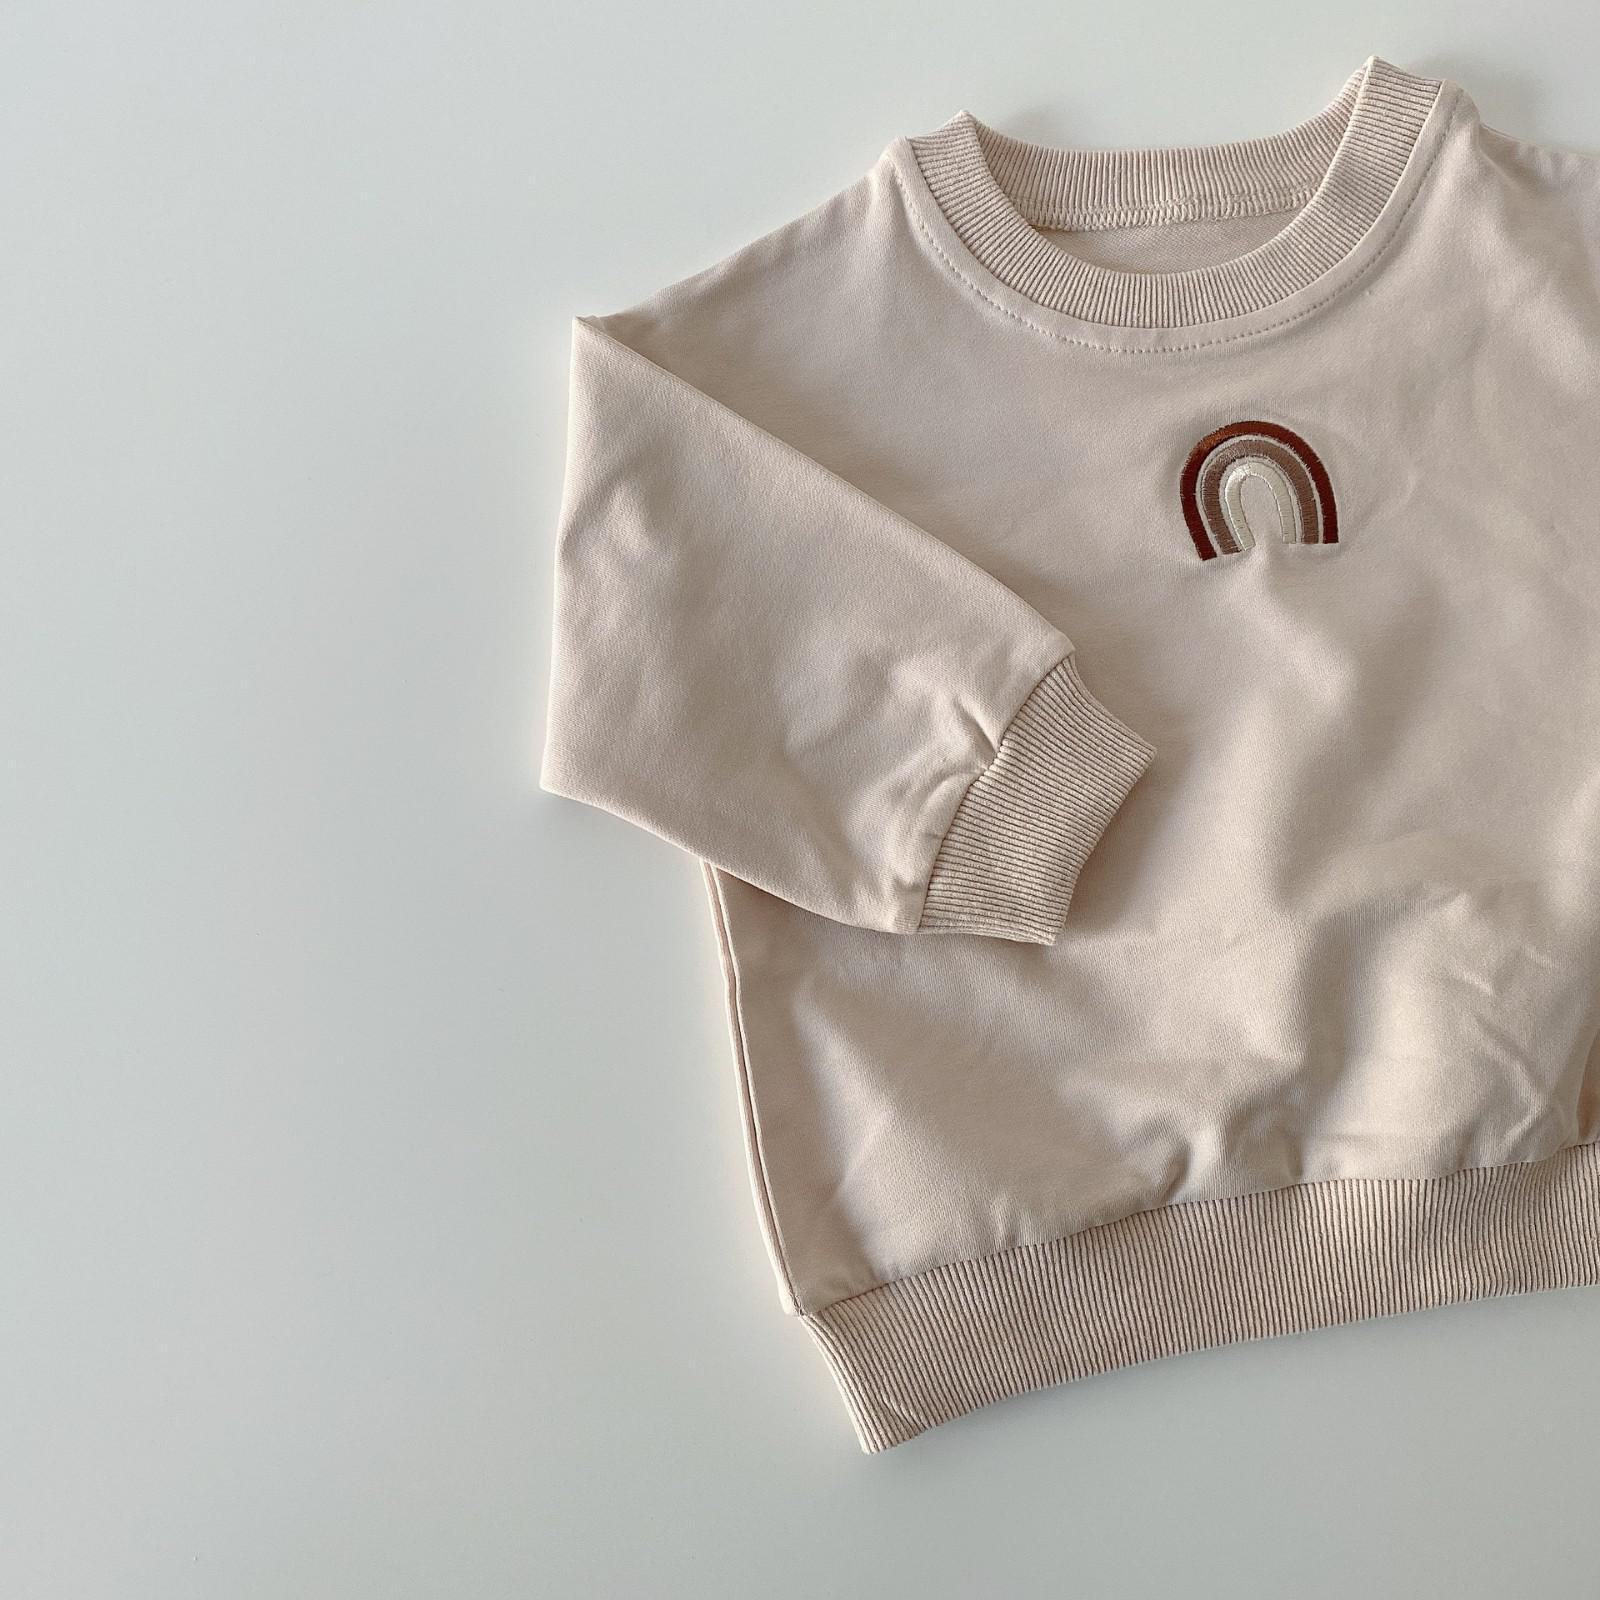 Autumn Baby Girls Embroidery Rainbow Sweatshirts Long Sleeve Tops Kids Toddler Boys Pullover Sweatshirt Rainbow T-shirt Clothes 8